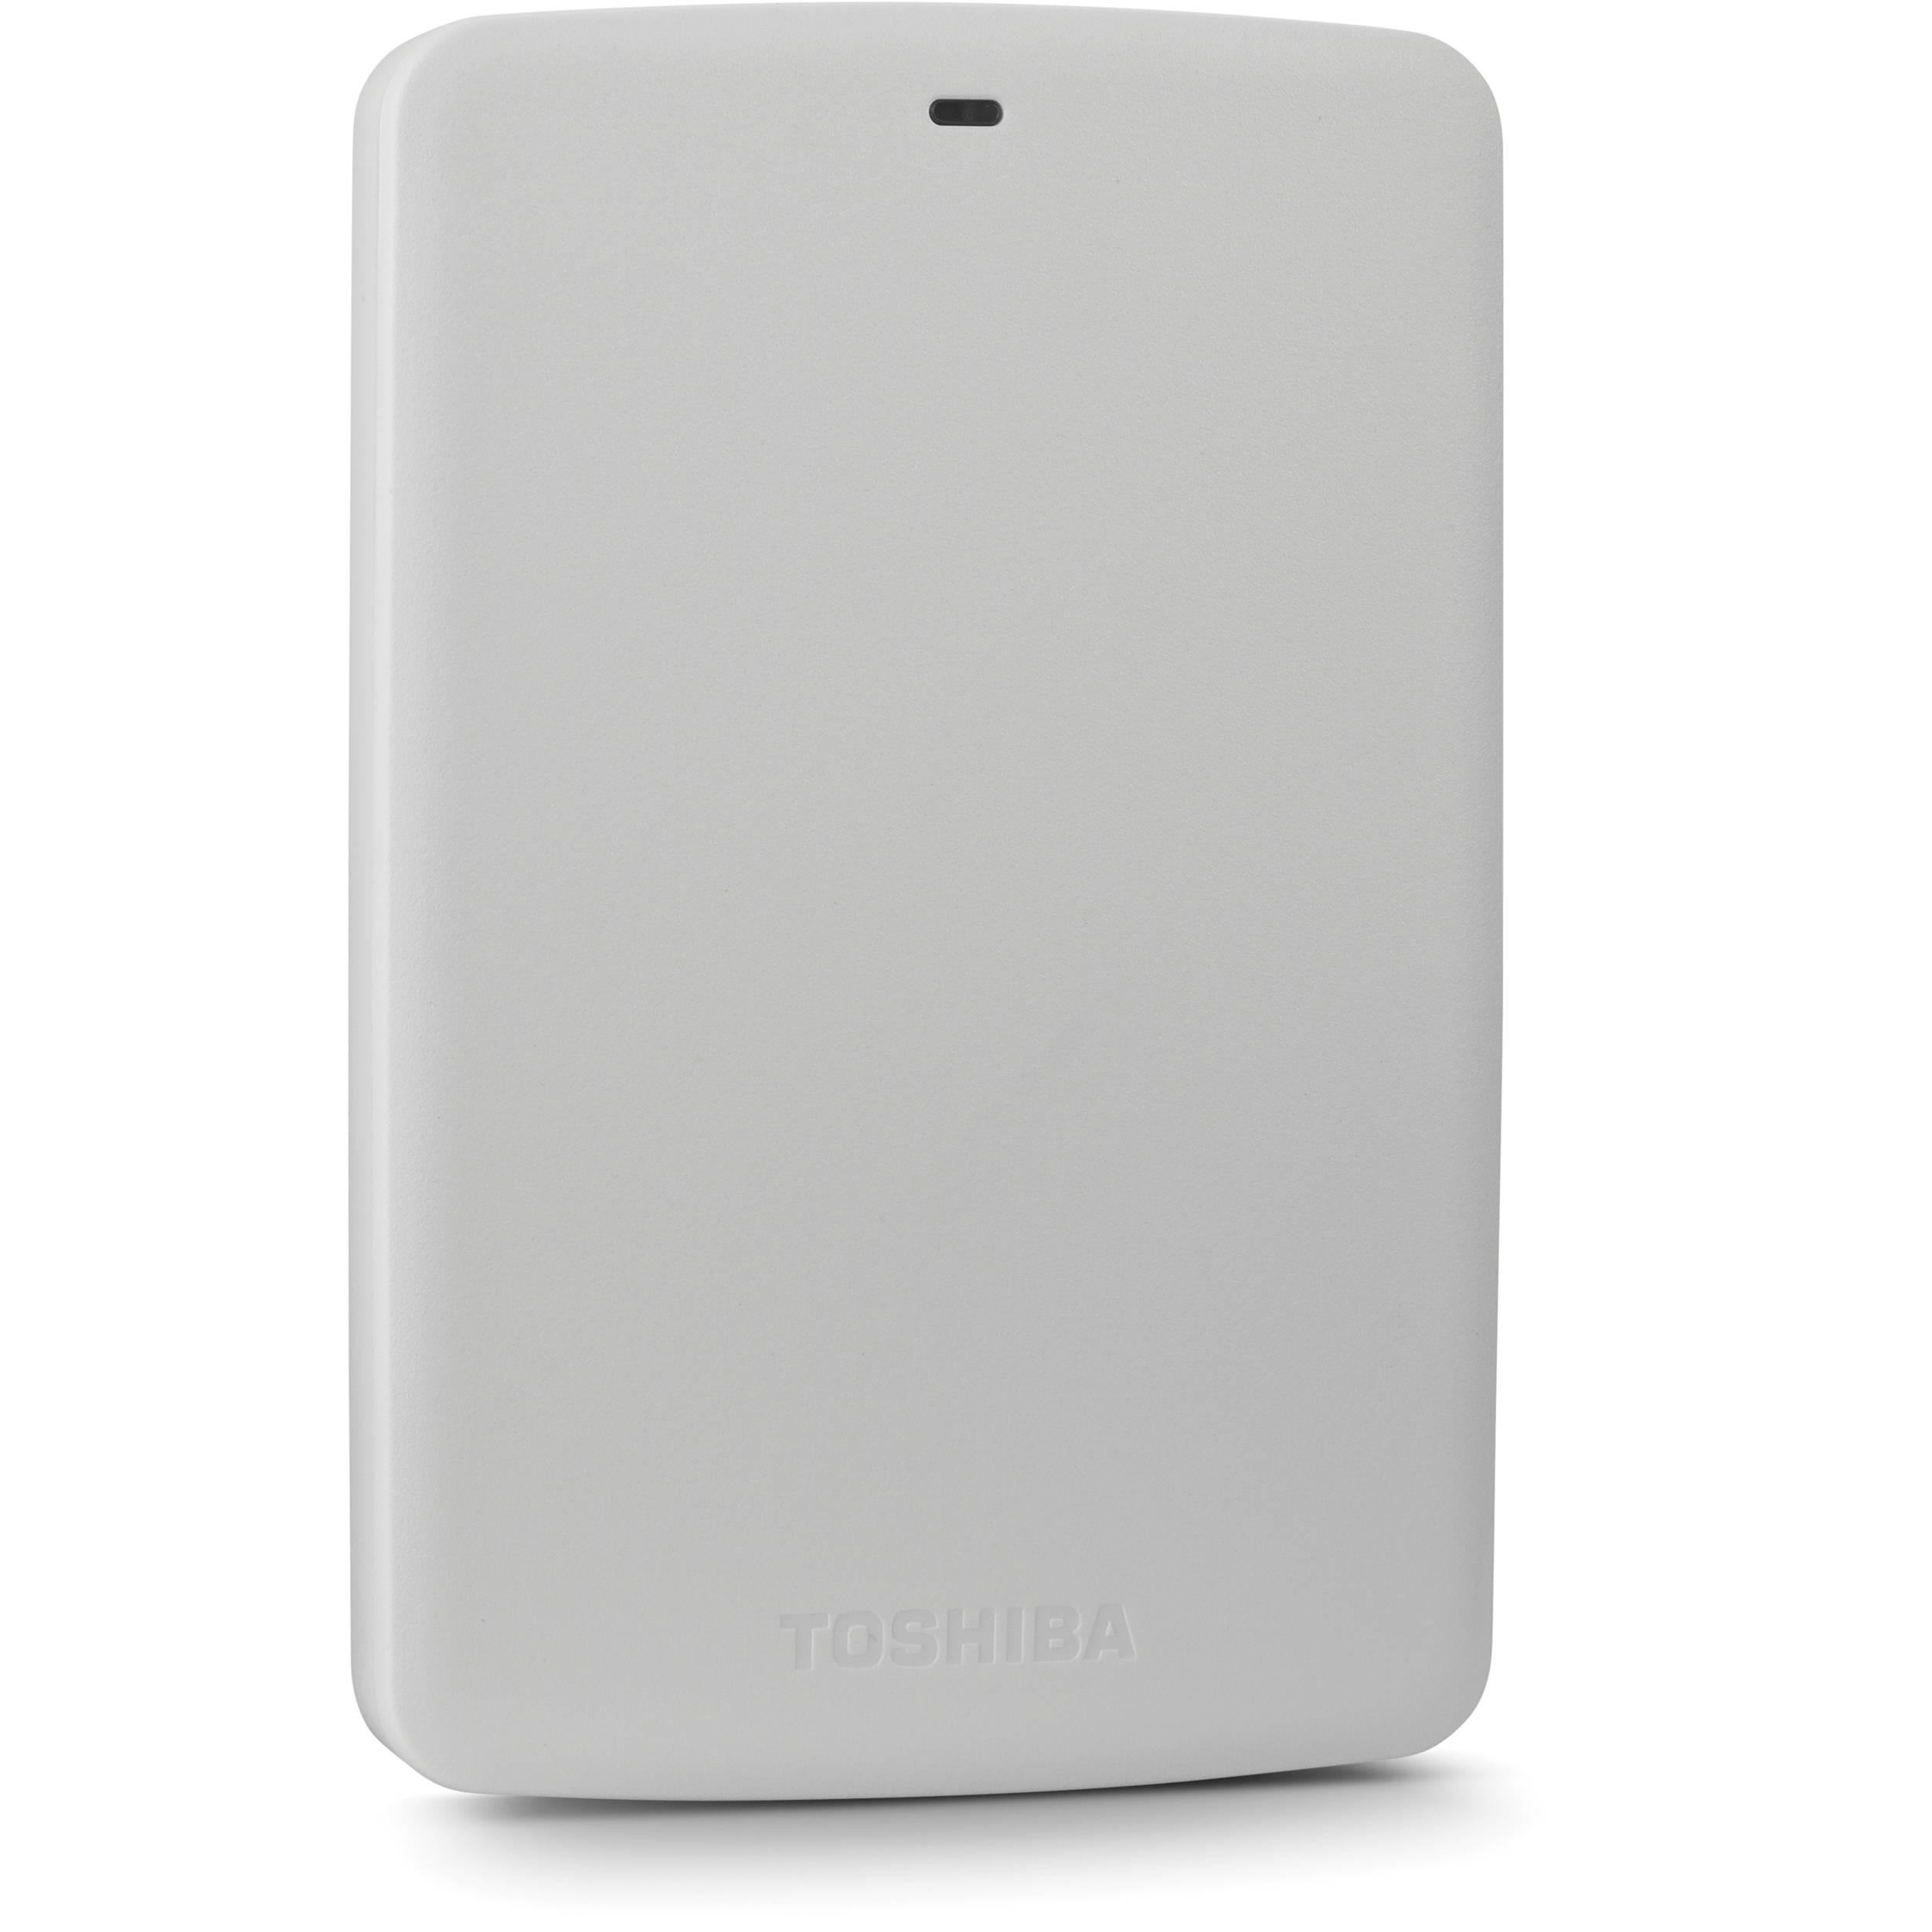 Toshiba 1tb Canvio Basics 5400 Rpm Usb 30 External Hdtb310xw3aa Hardisk Hard Drive White